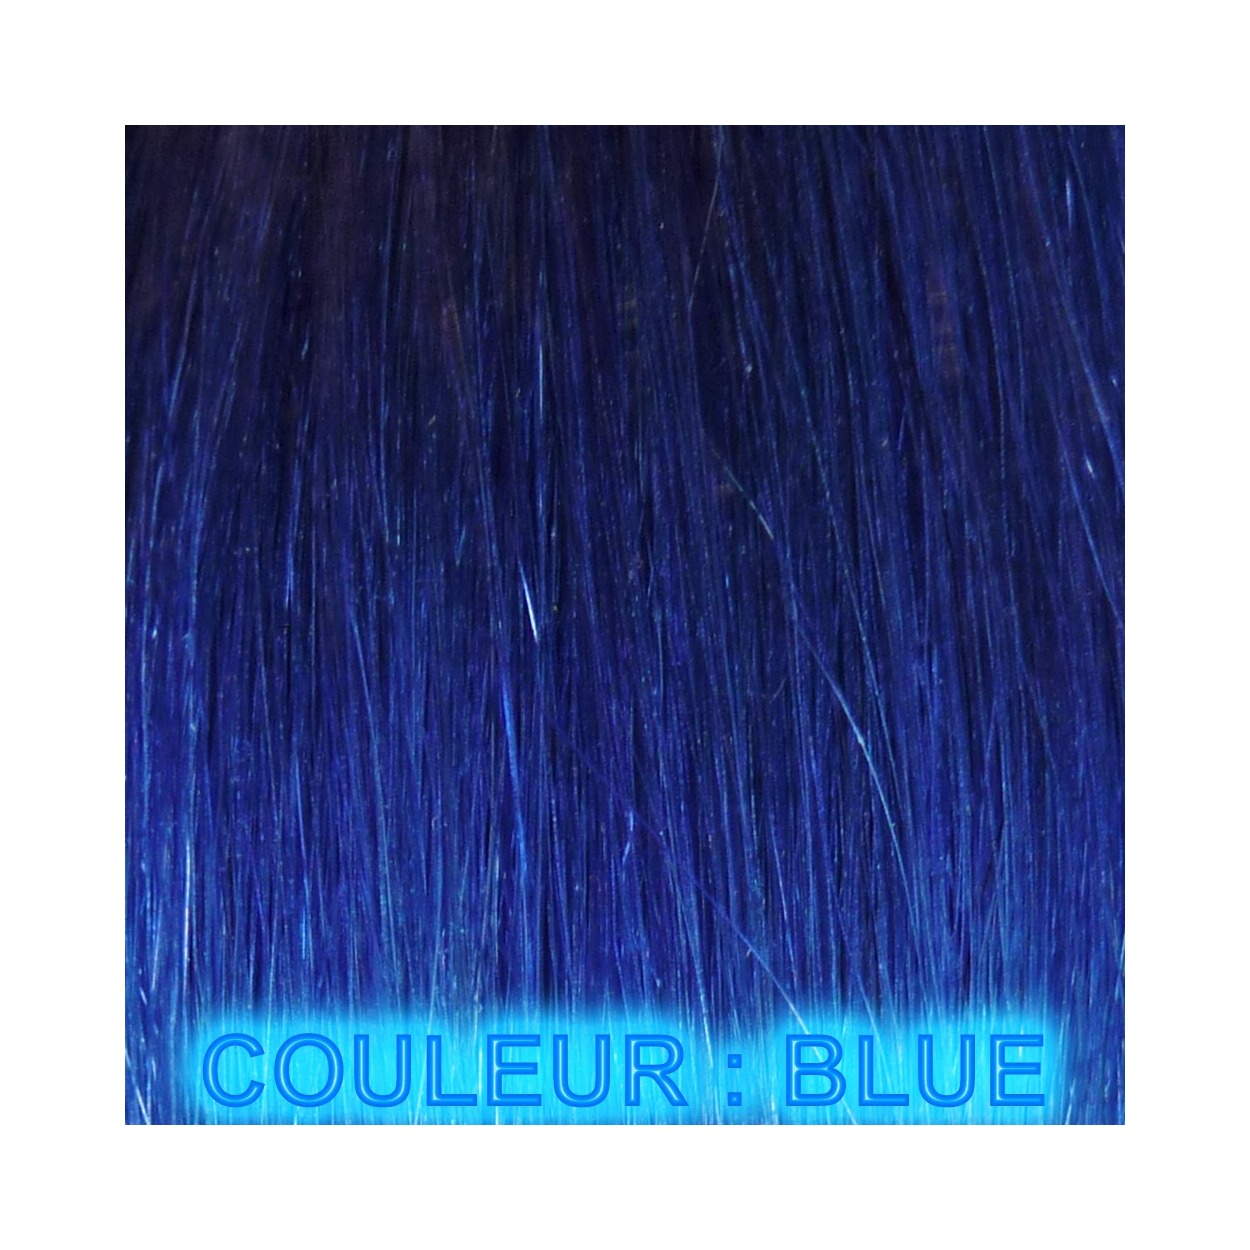 prixcanon lot de 140 extensions cheveux remy pose a chaud 100 naturels. Black Bedroom Furniture Sets. Home Design Ideas